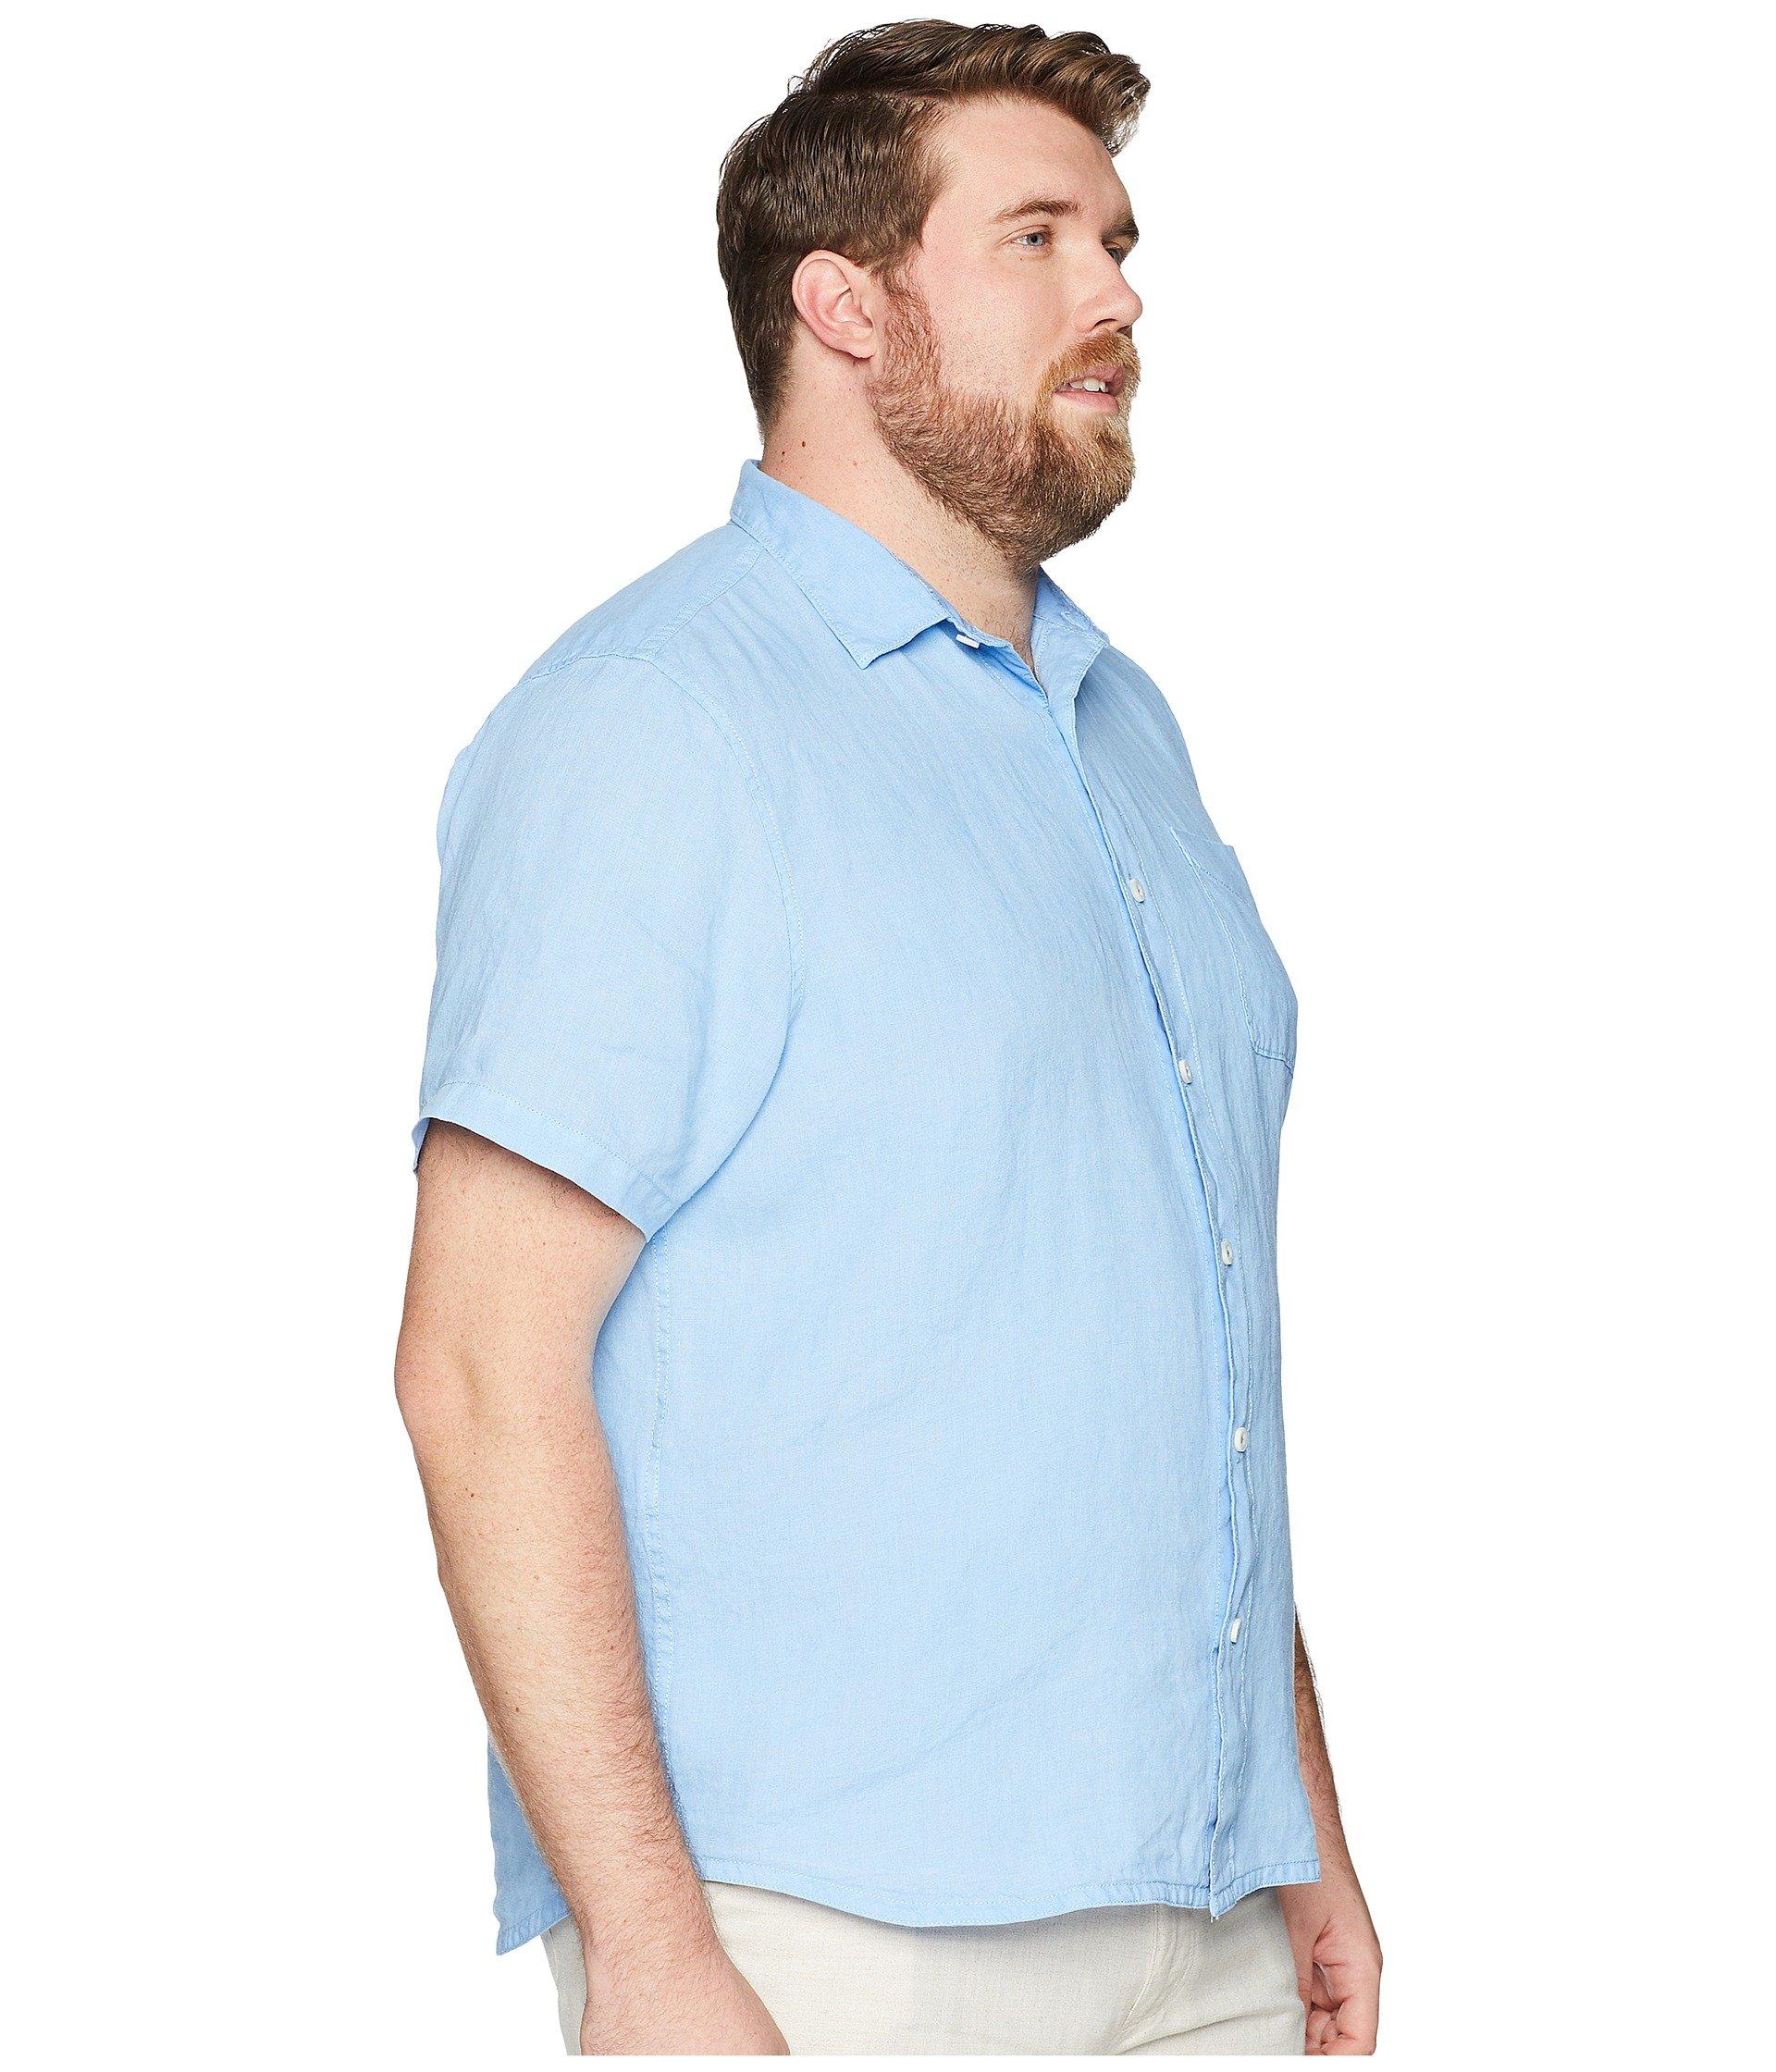 Tommy Bahama Breezer Short Tall Blue Sleeve Shirt Glass amp; Big Sea Yonde rwrZdxHp